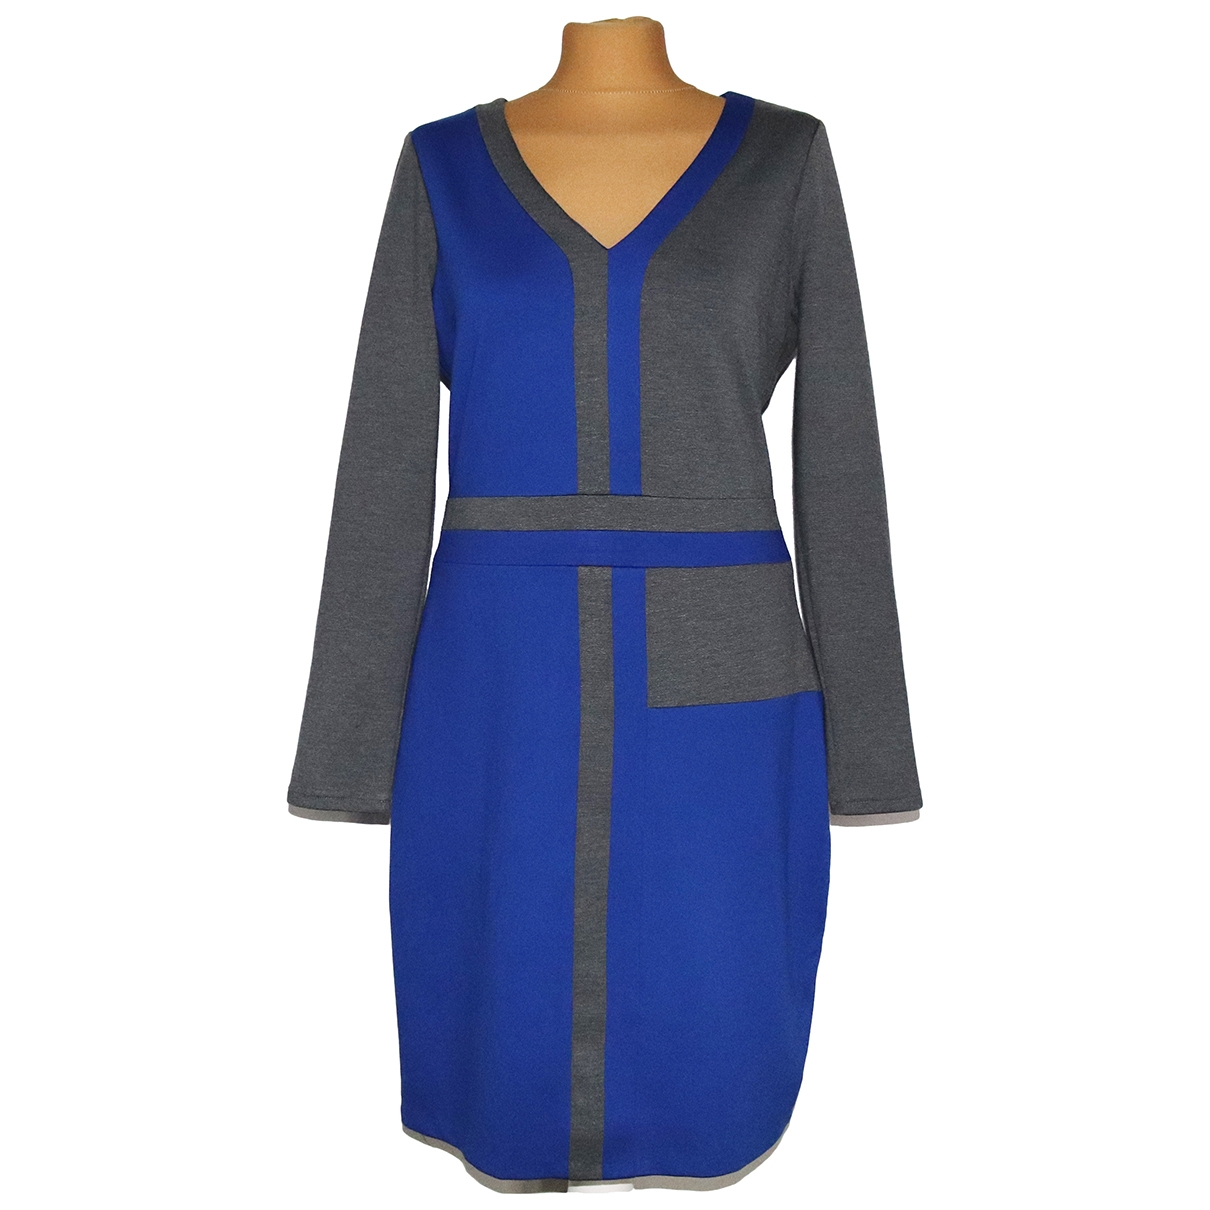 Badgley Mischka - Robe   pour femme - multicolore